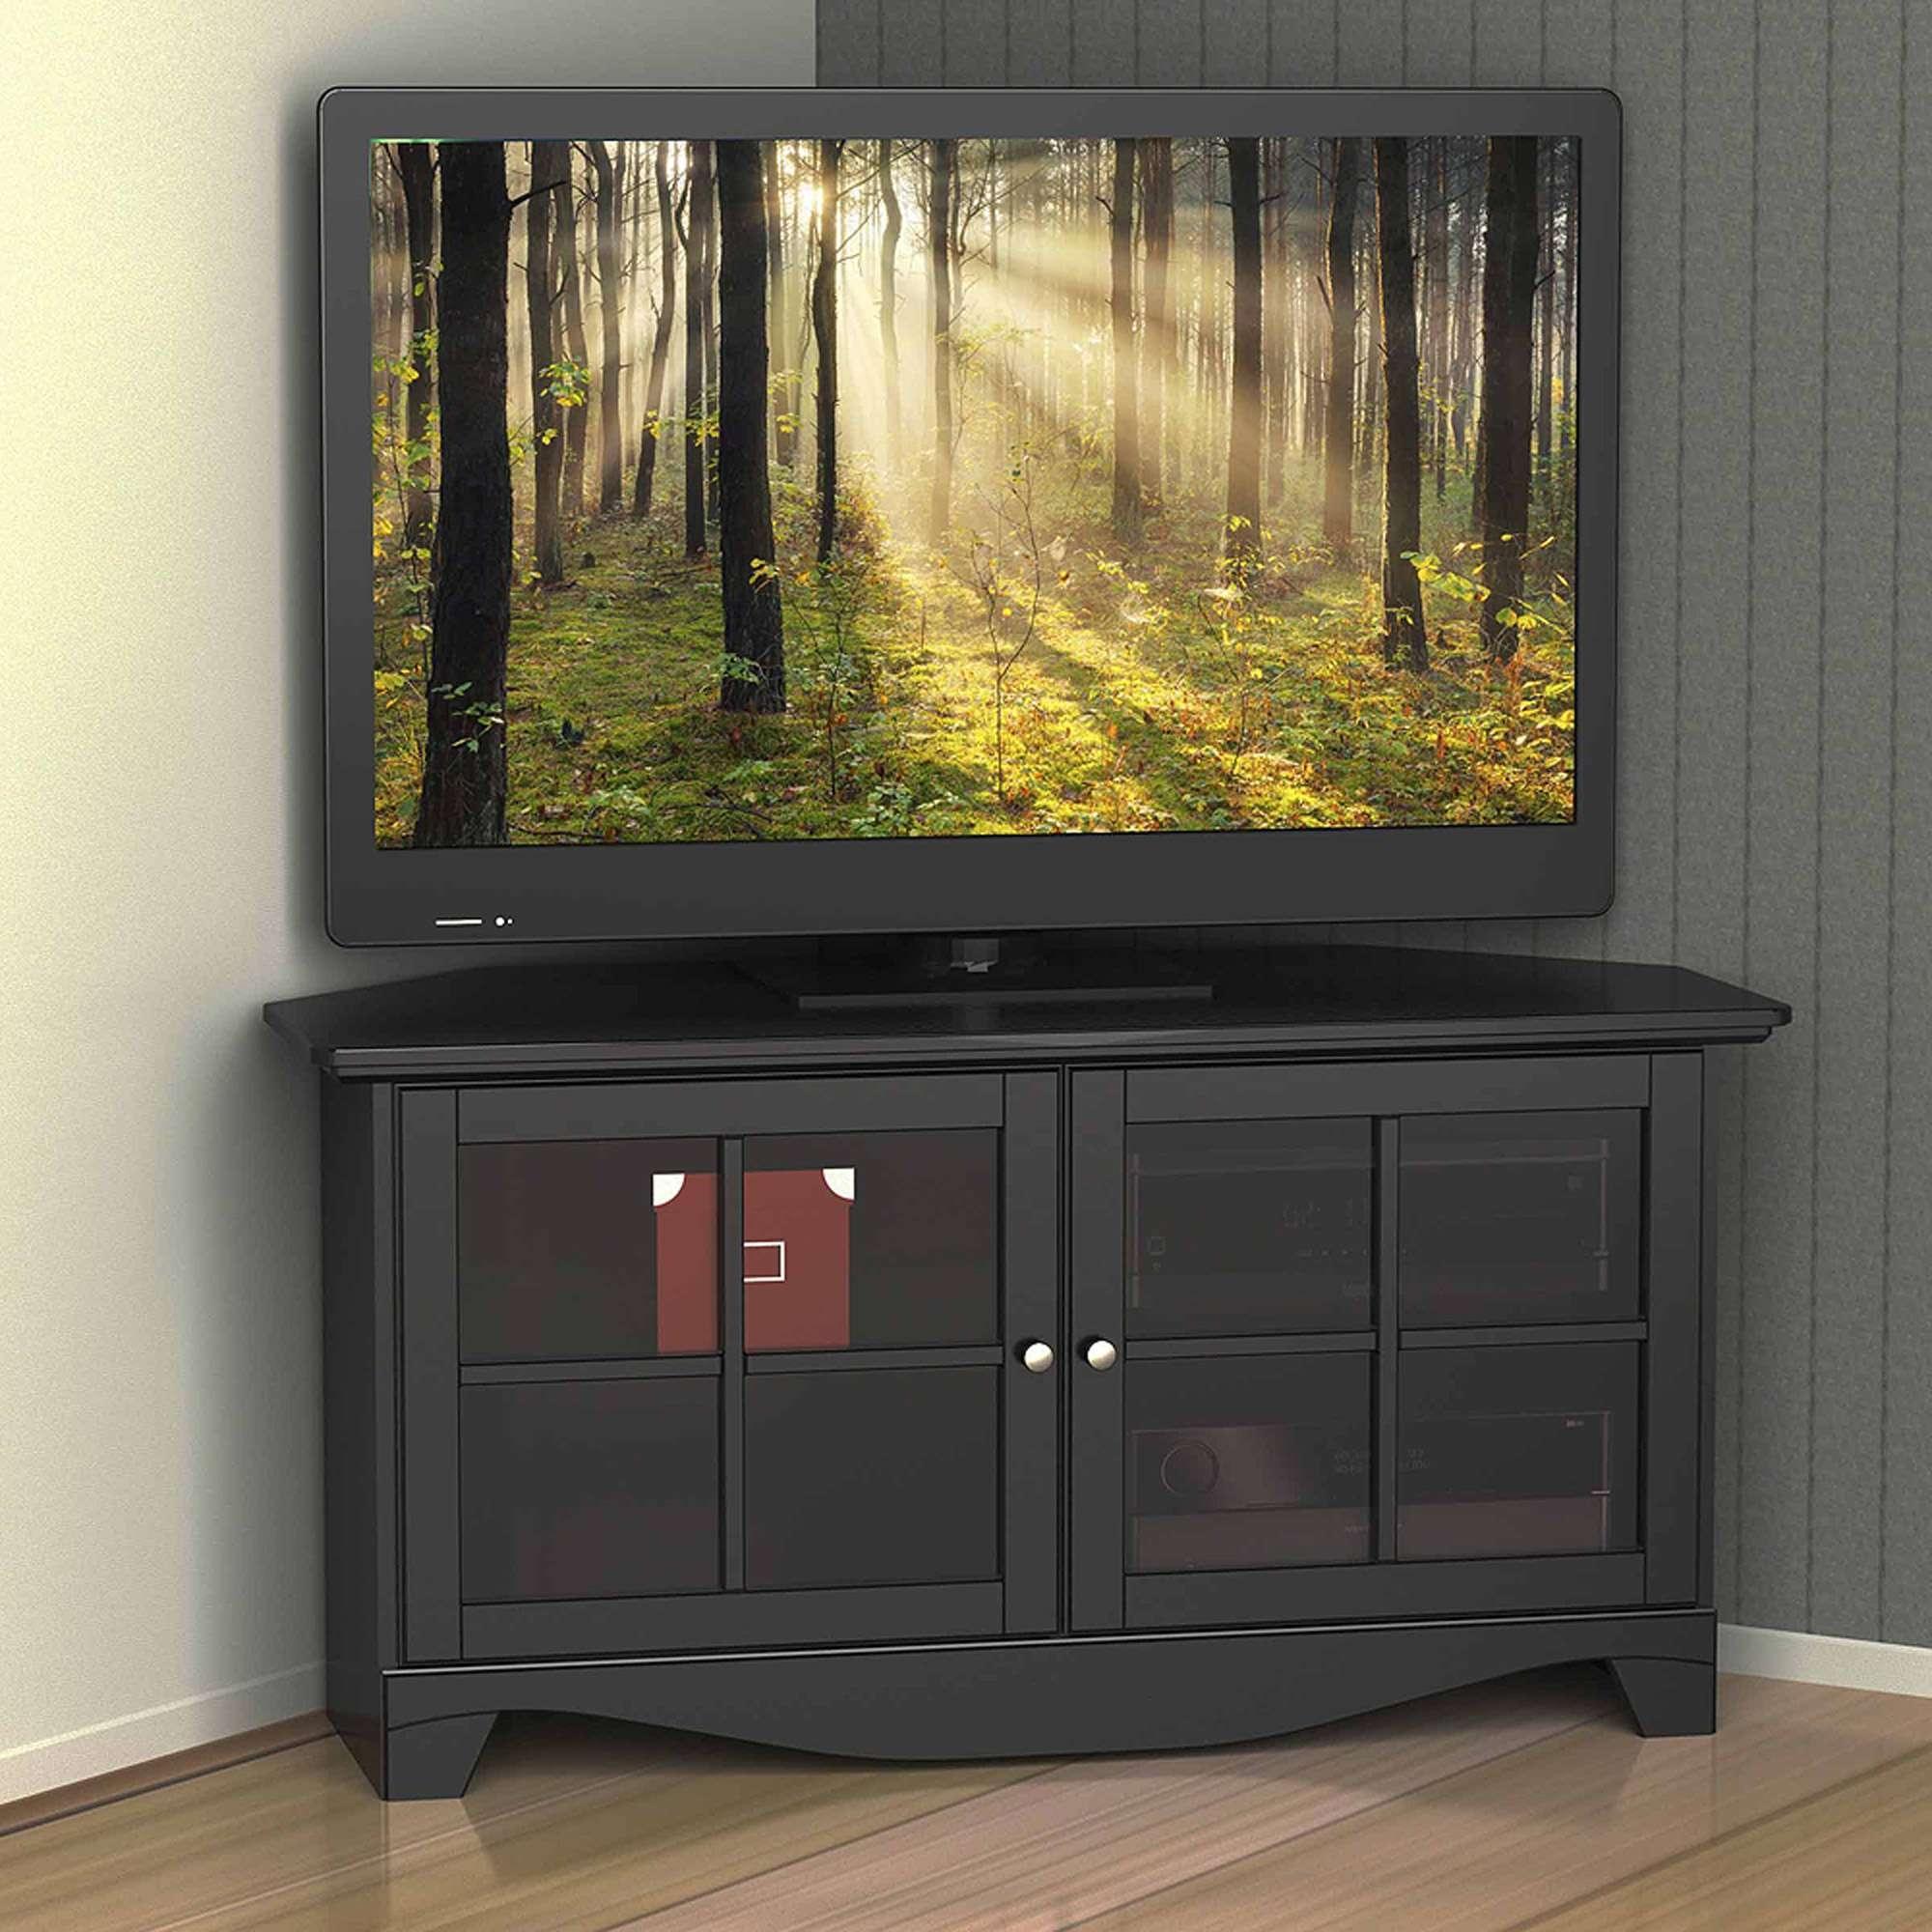 Nexera Pinnacle Black 2 Door Corner Tv Stand For Tvs Up To 49 With Cornet Tv Stands (View 11 of 15)